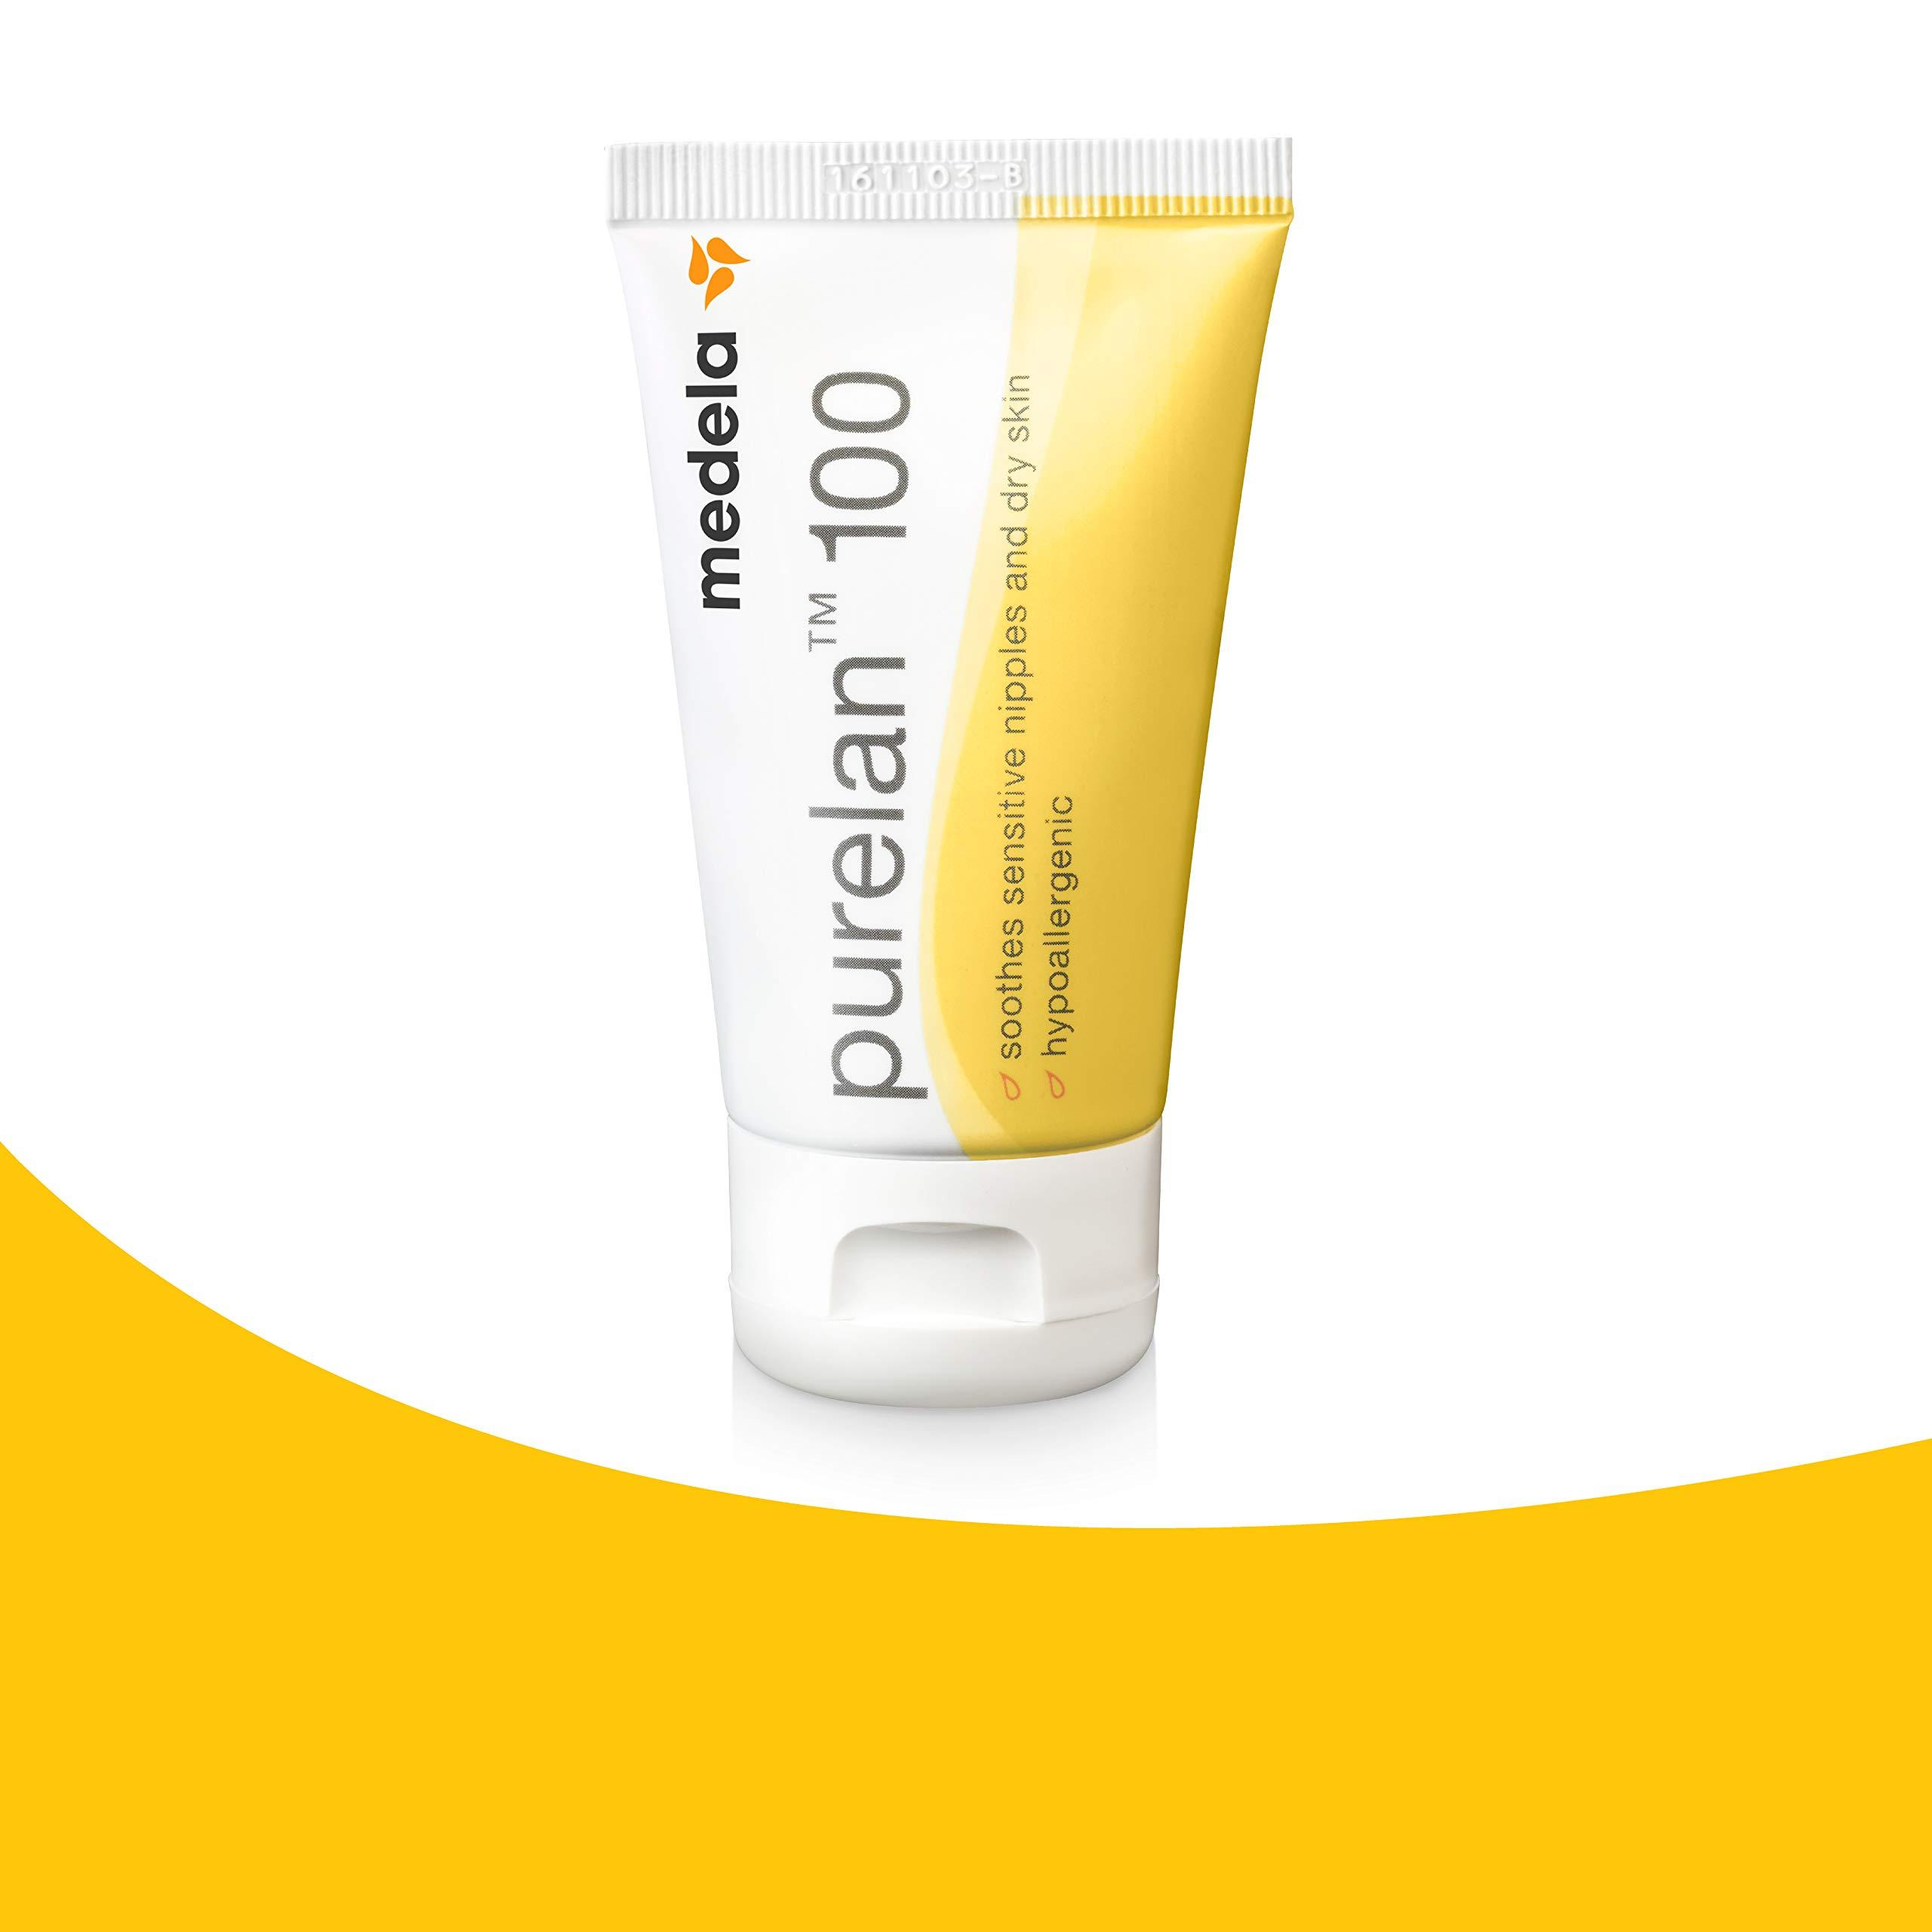 Purelan 100 Nipple Cream - 37g by Medela